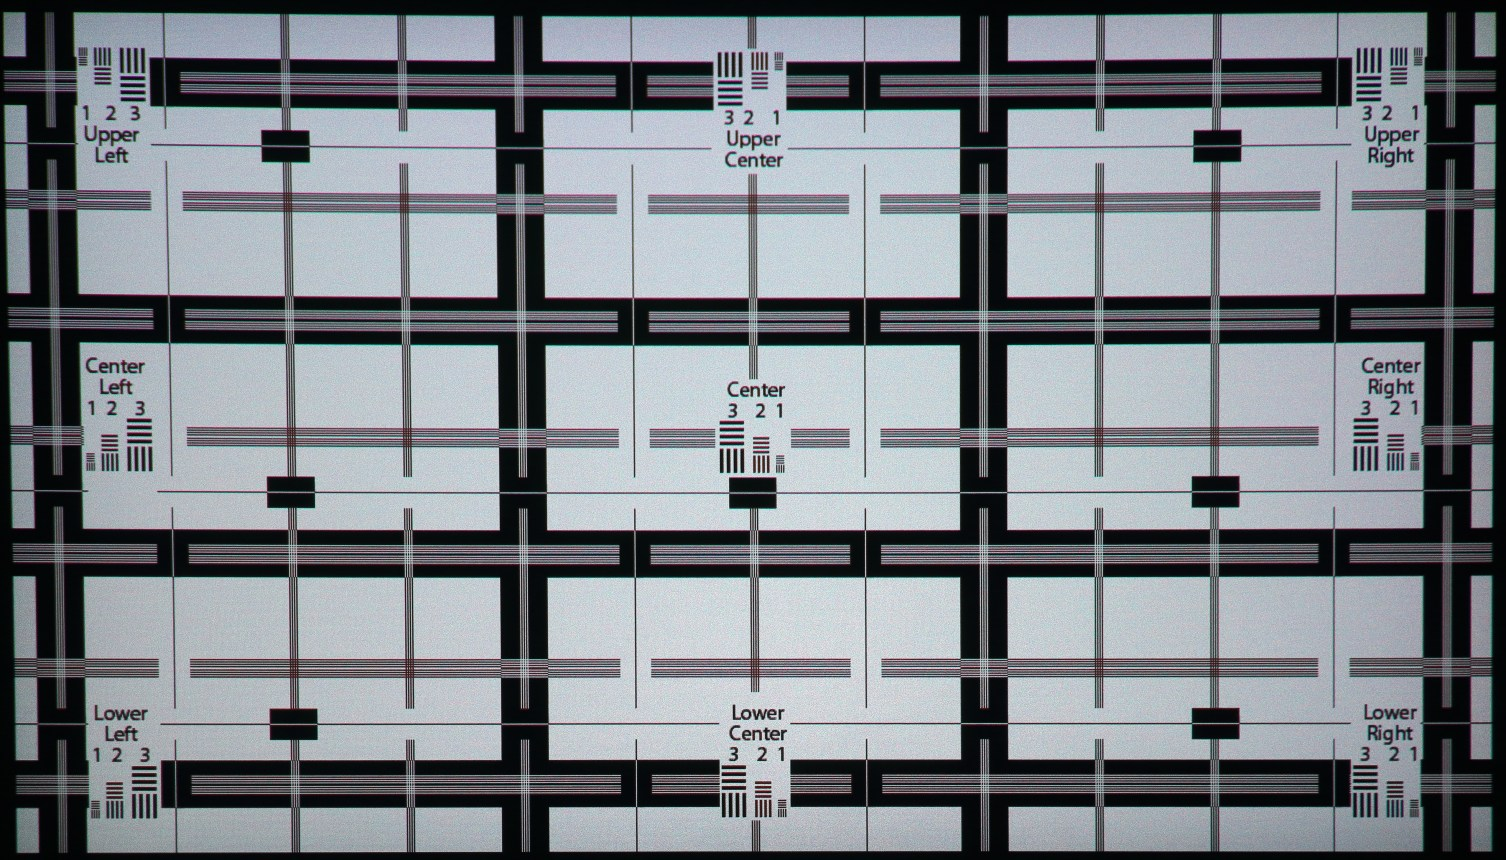 img_0231-uo-test-chart